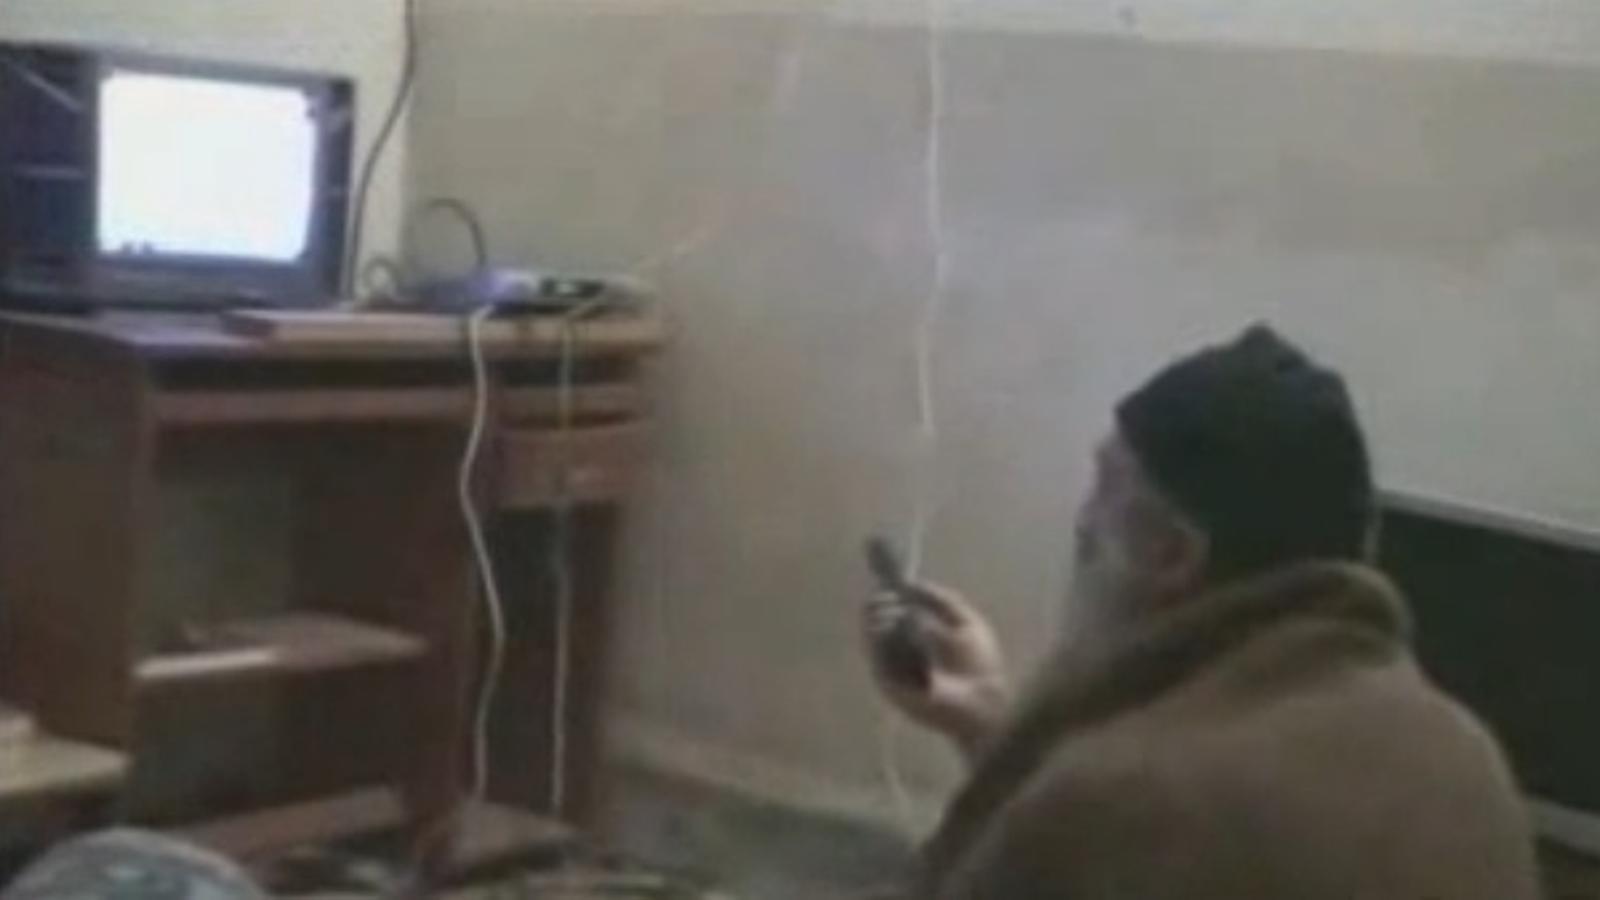 Bin Laden mira a la TV vídeos on apareix ell mateix